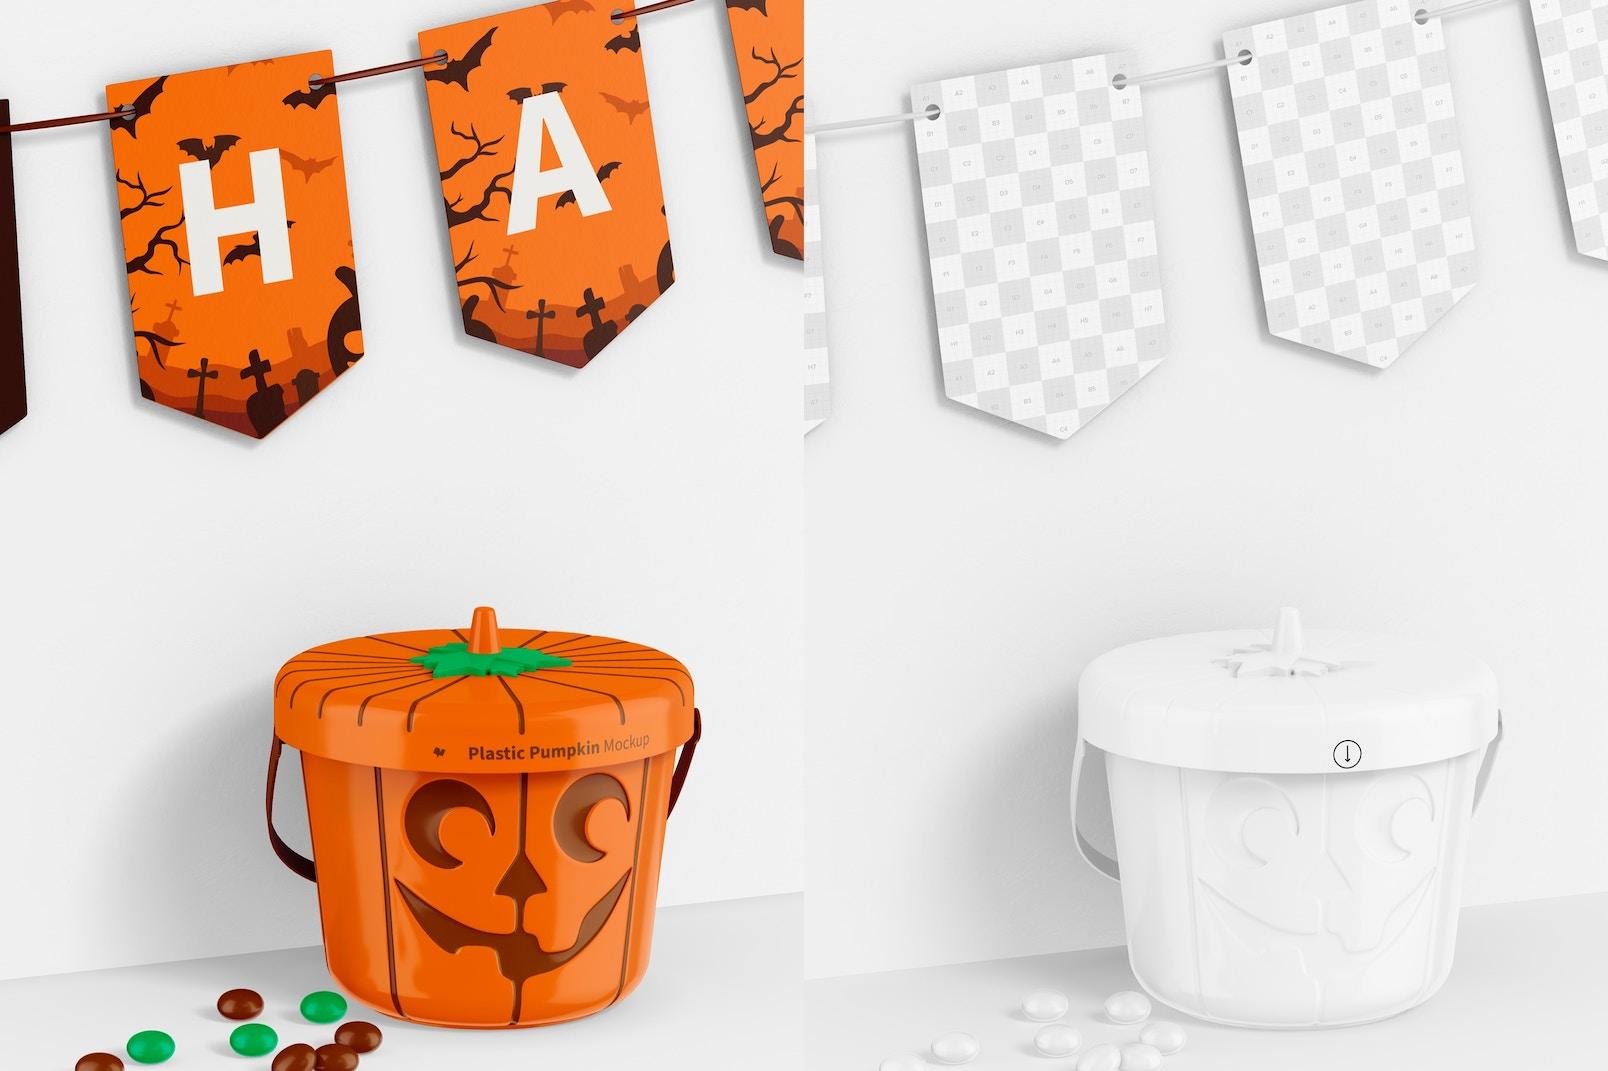 Plastic Pumpkin Mockup